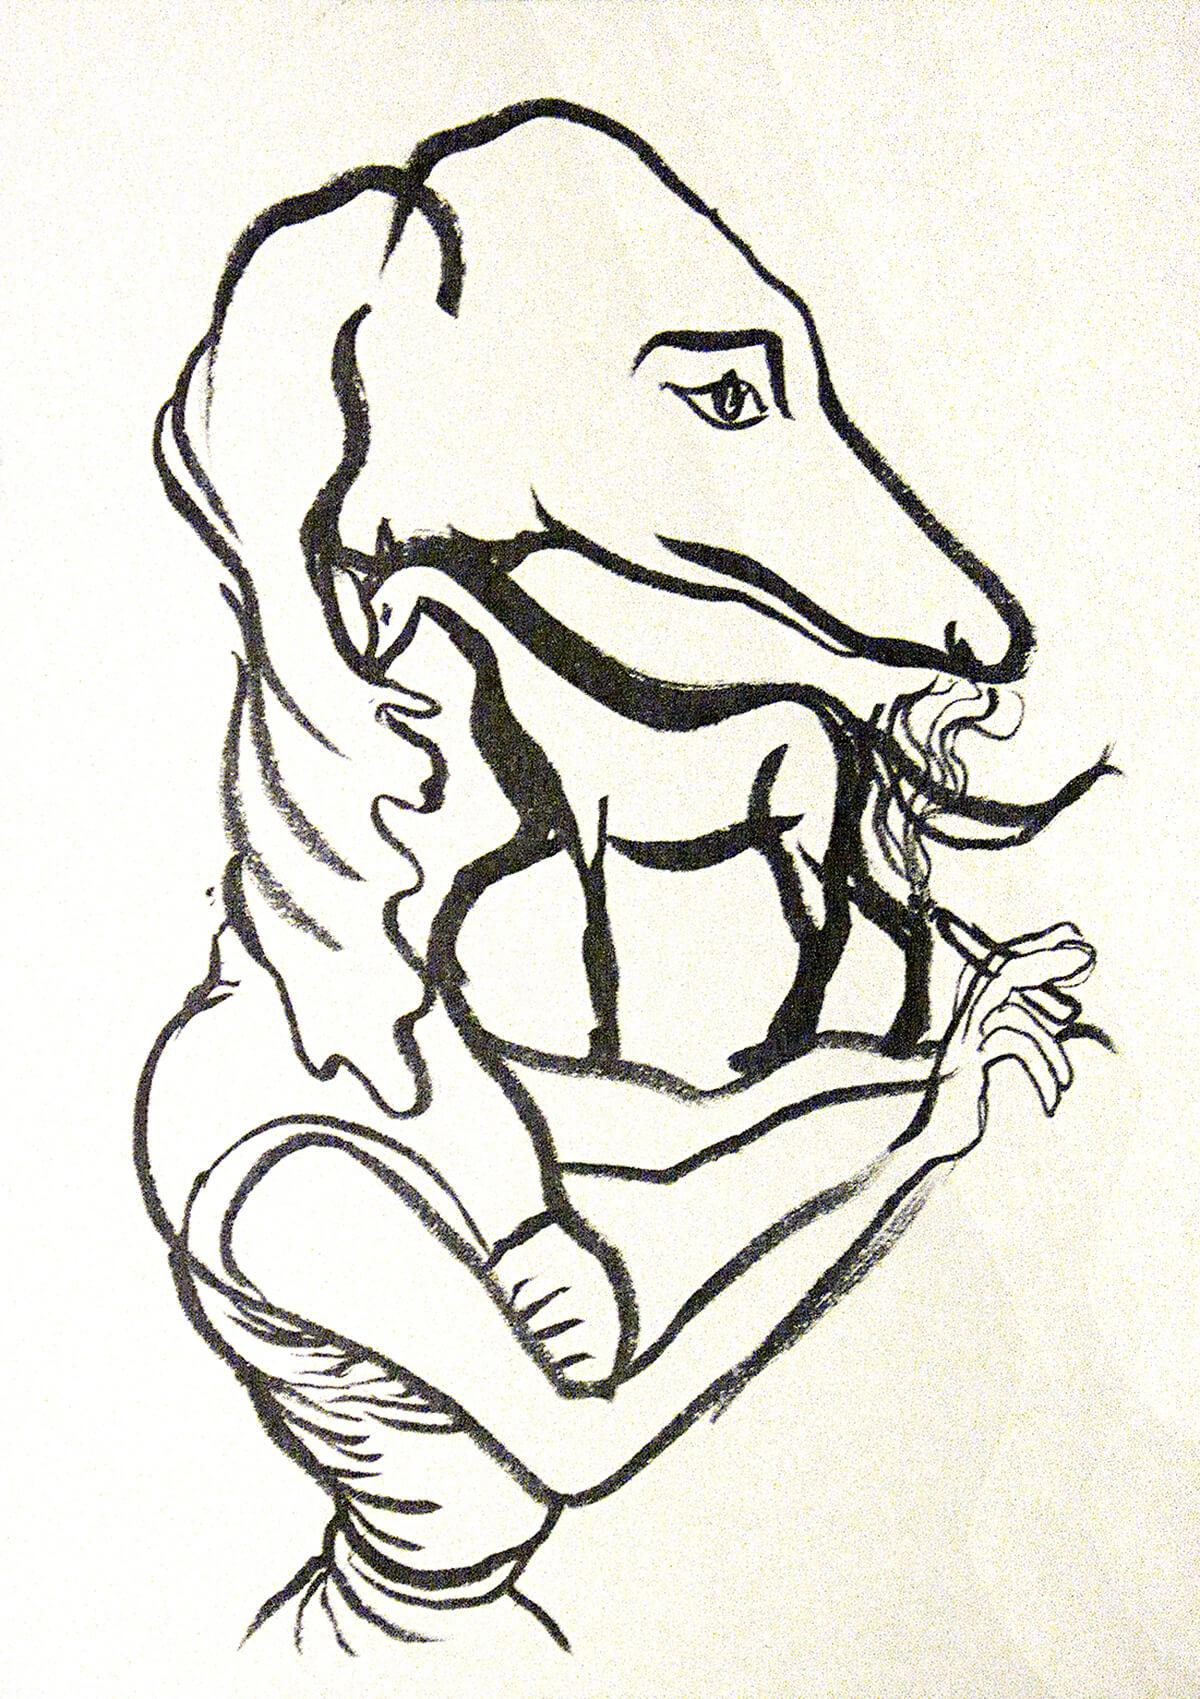 untitled (smoking dog), 16 x 11 cm, ink on paper, 2013